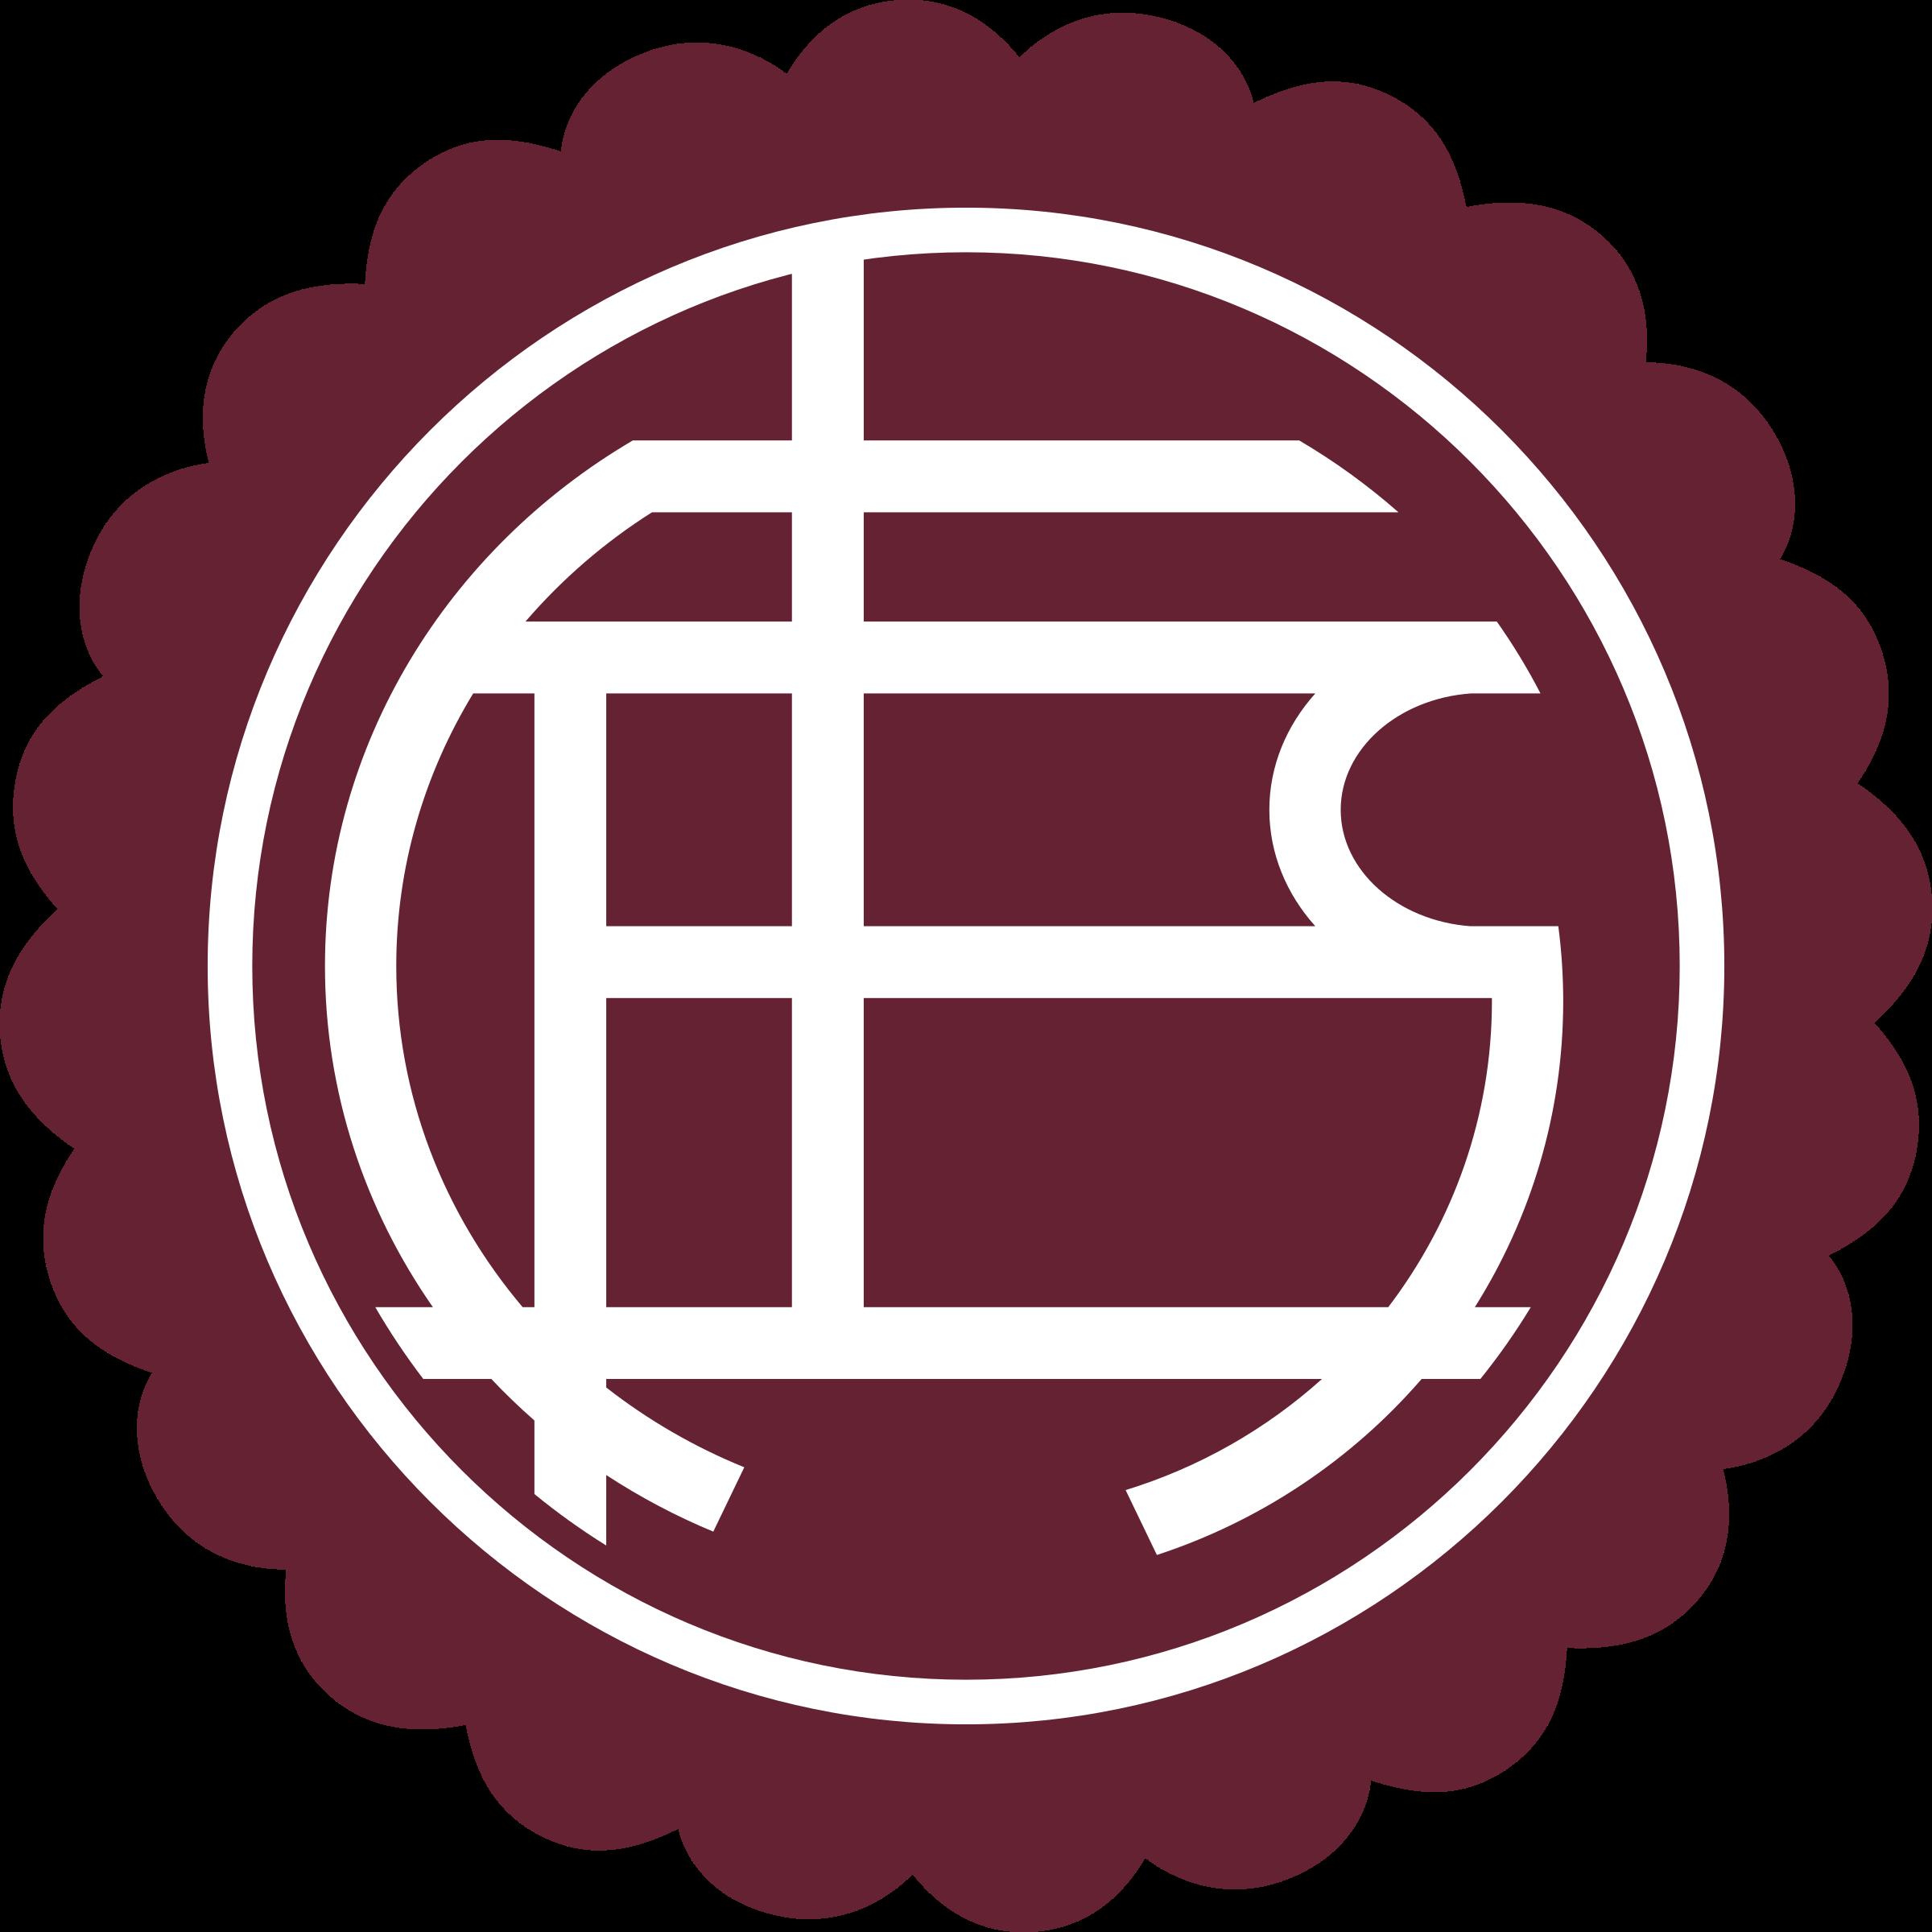 LANUS Logo PNG Transparent & SVG Vector.